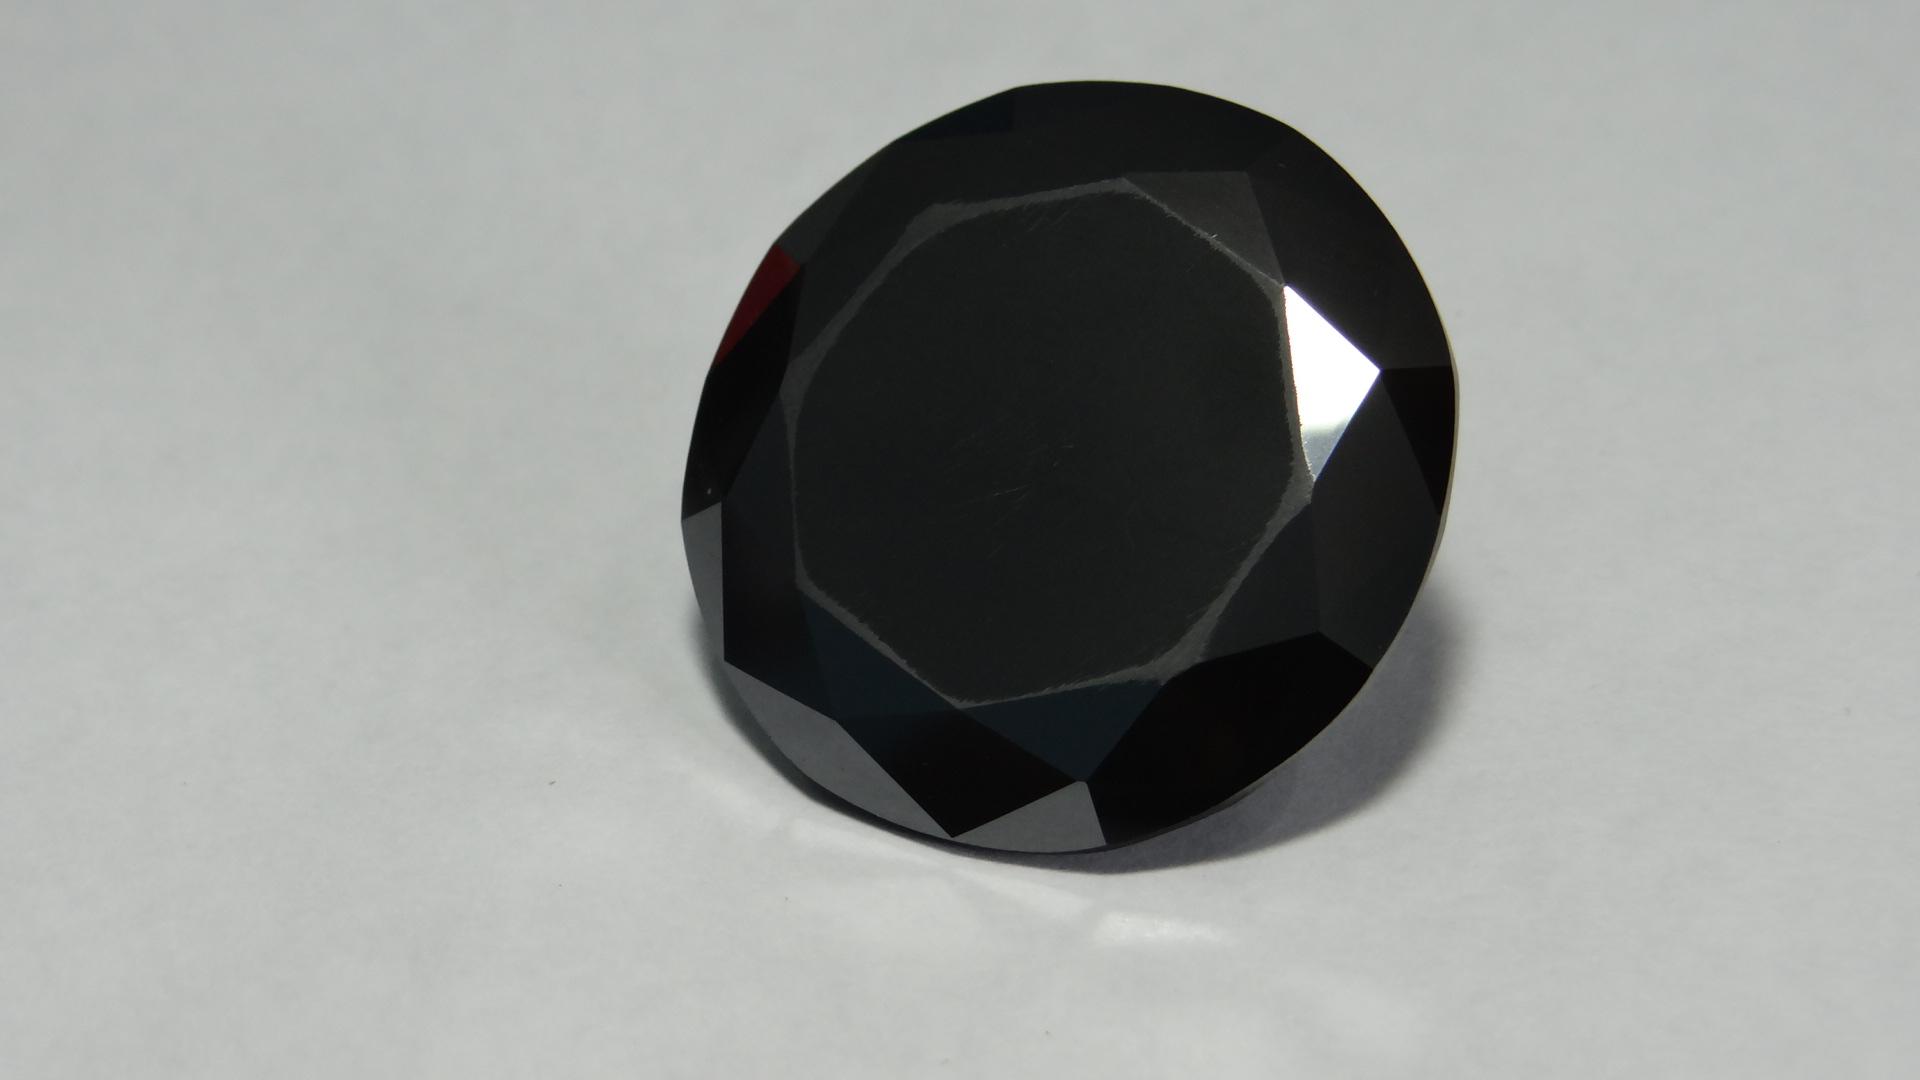 Gia Certified Diamond Rings Online